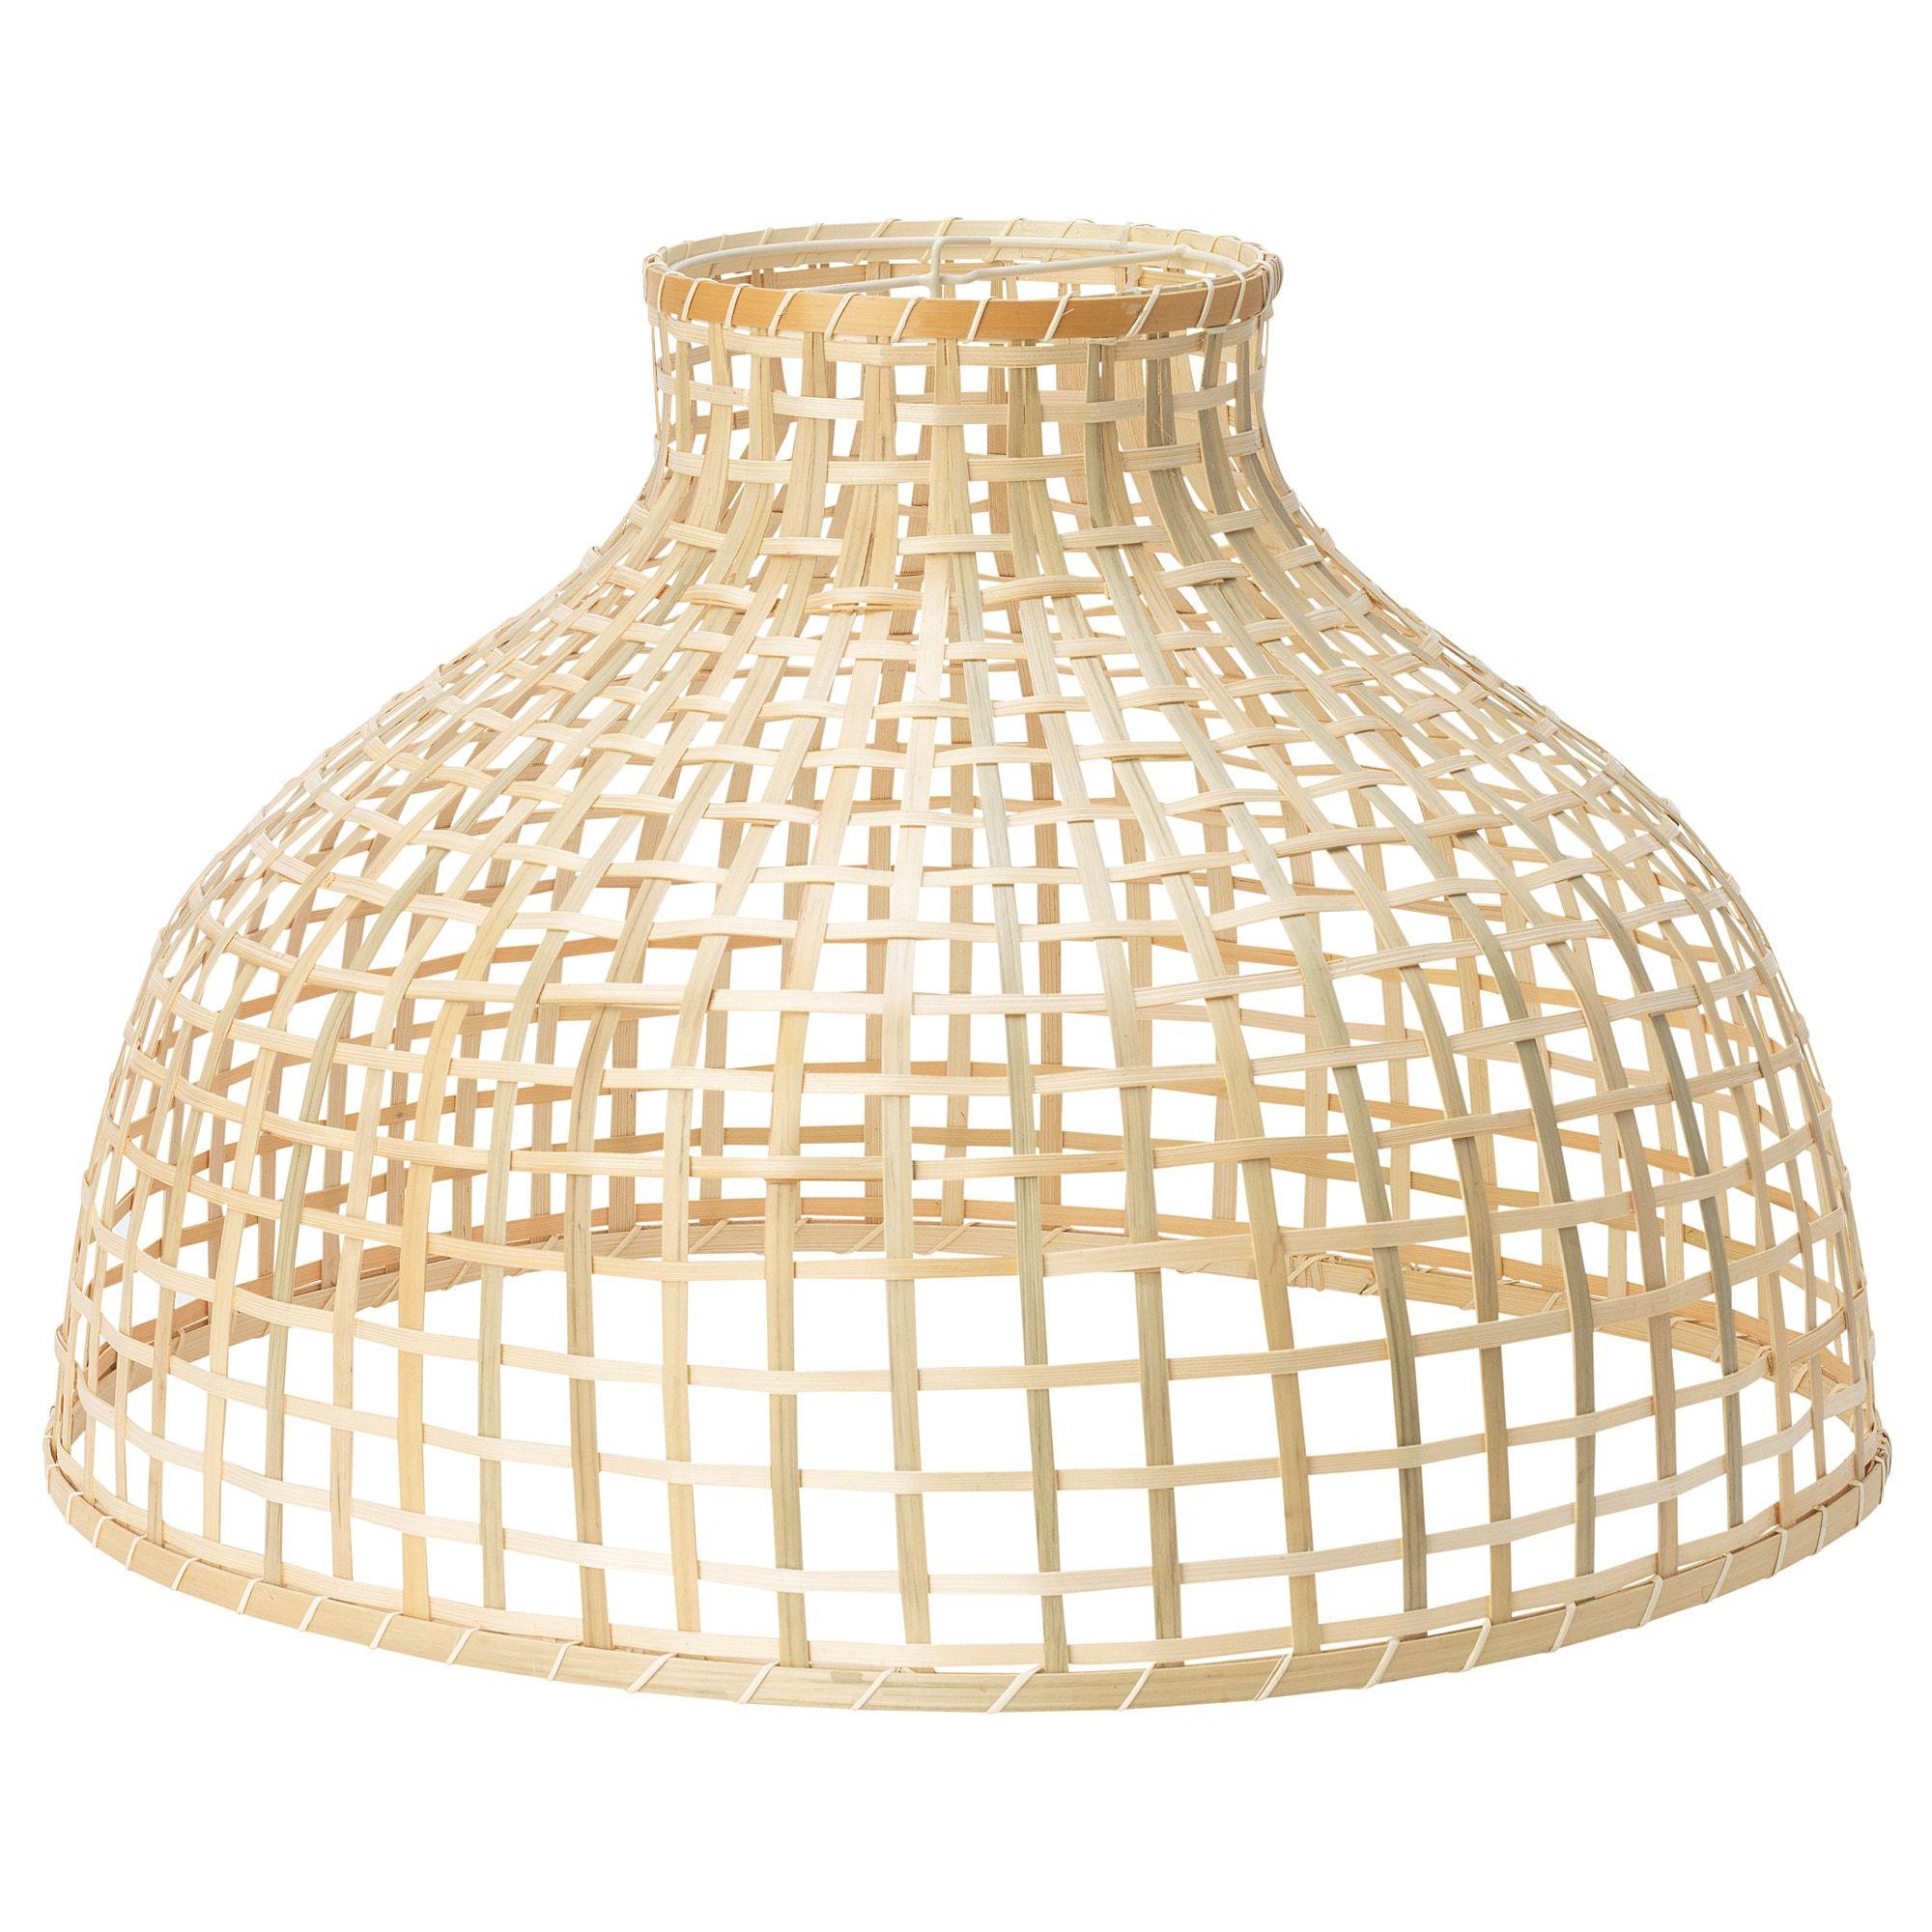 Ikea Gottorp Pendant Lamp Shade Each Handmade Natural Fiber Shade Is Unique Pendant Lamp Shade Pendant Lamp